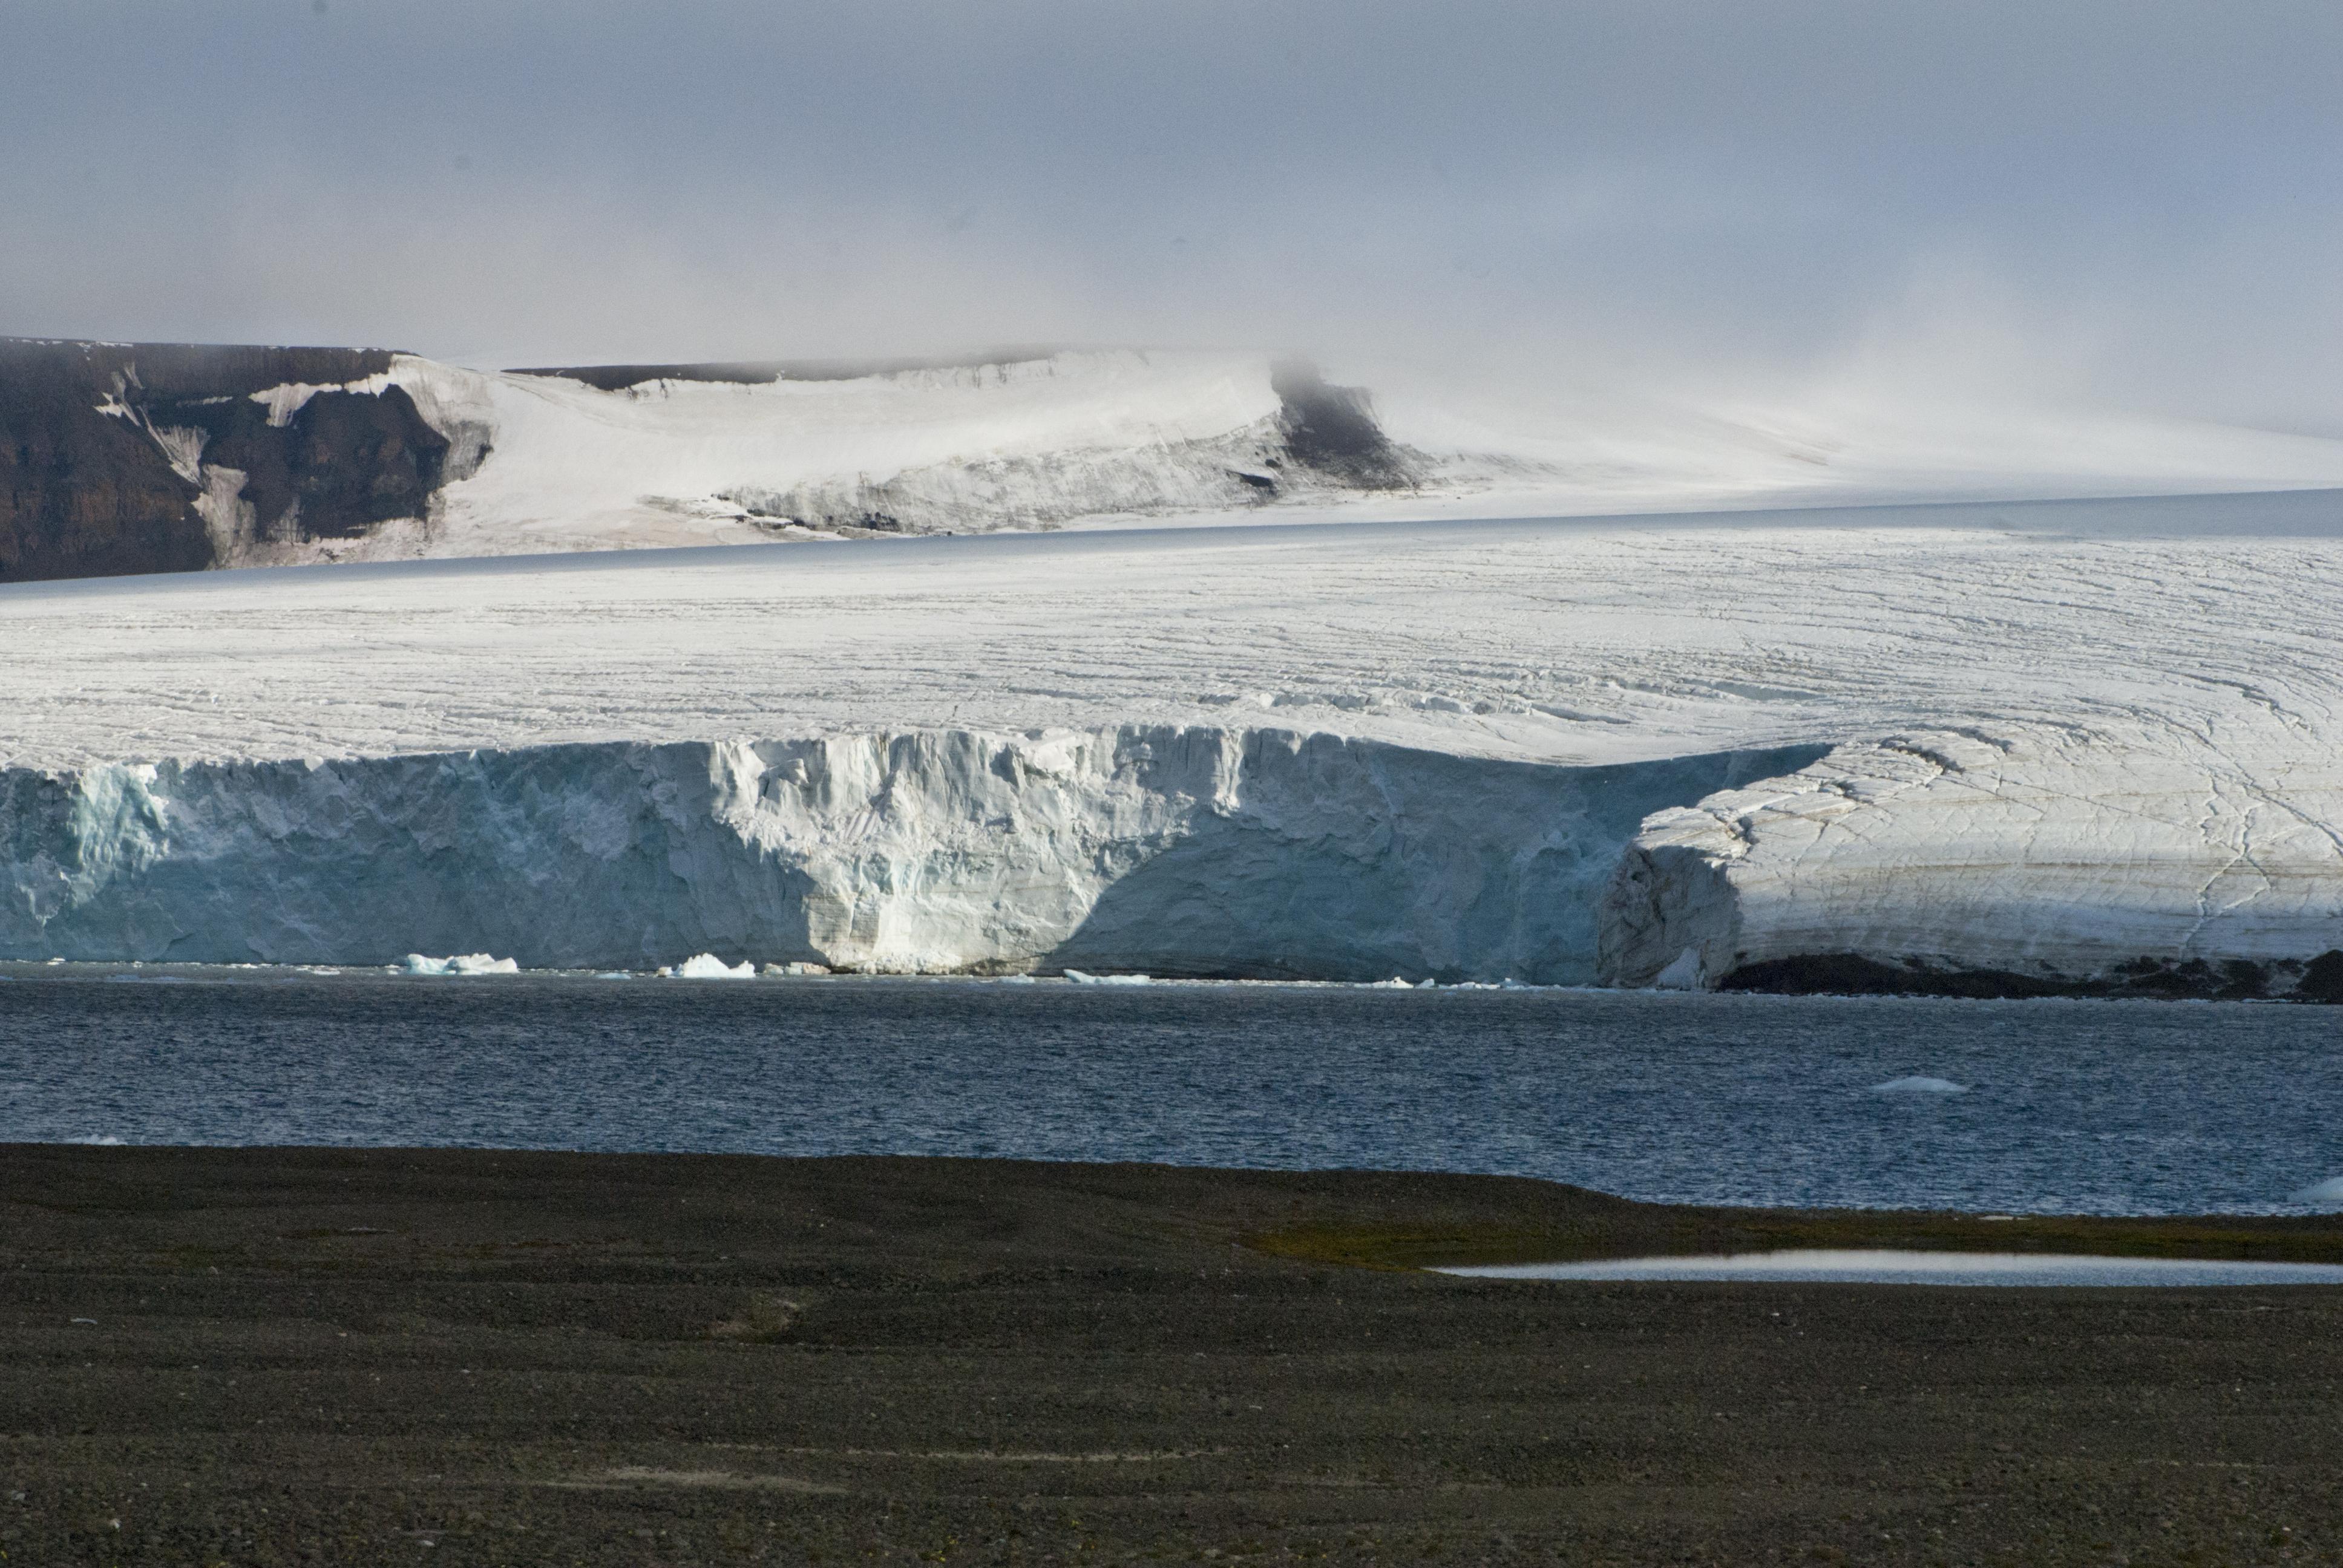 glacier front on mabel island franz josef land russian arctic